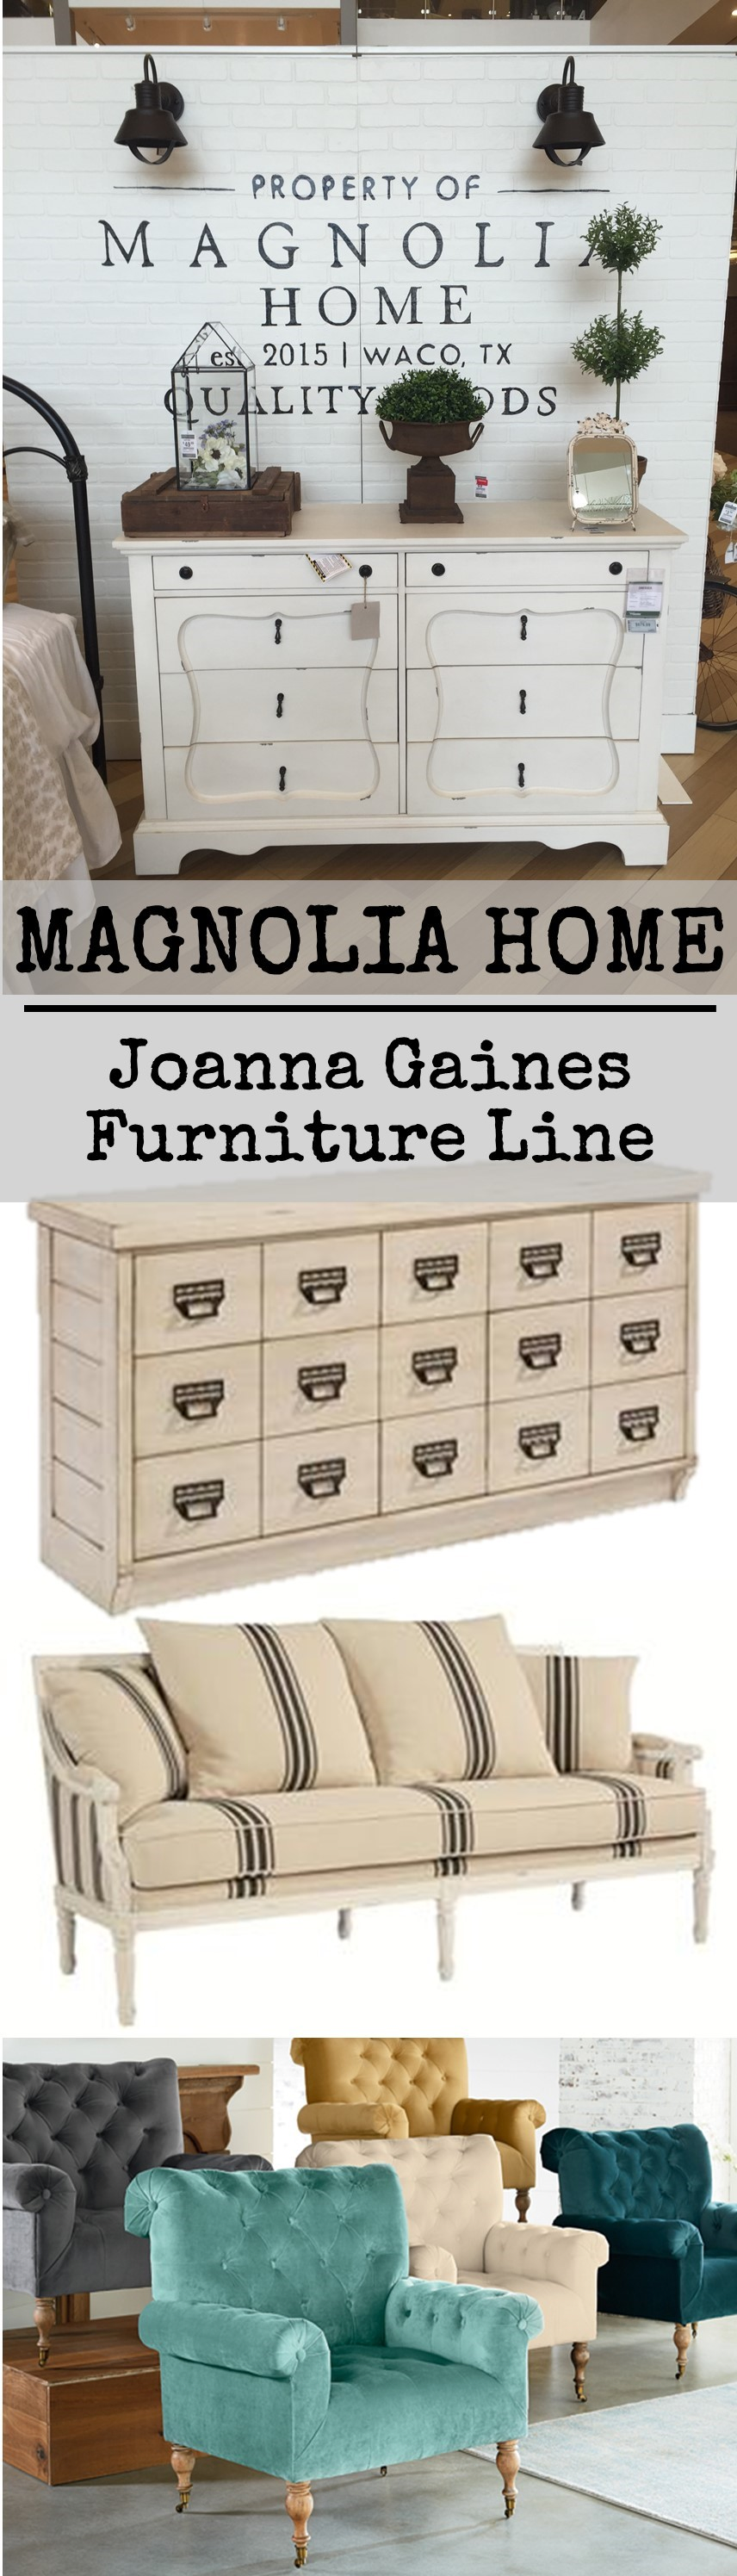 Magnolia Home (39)